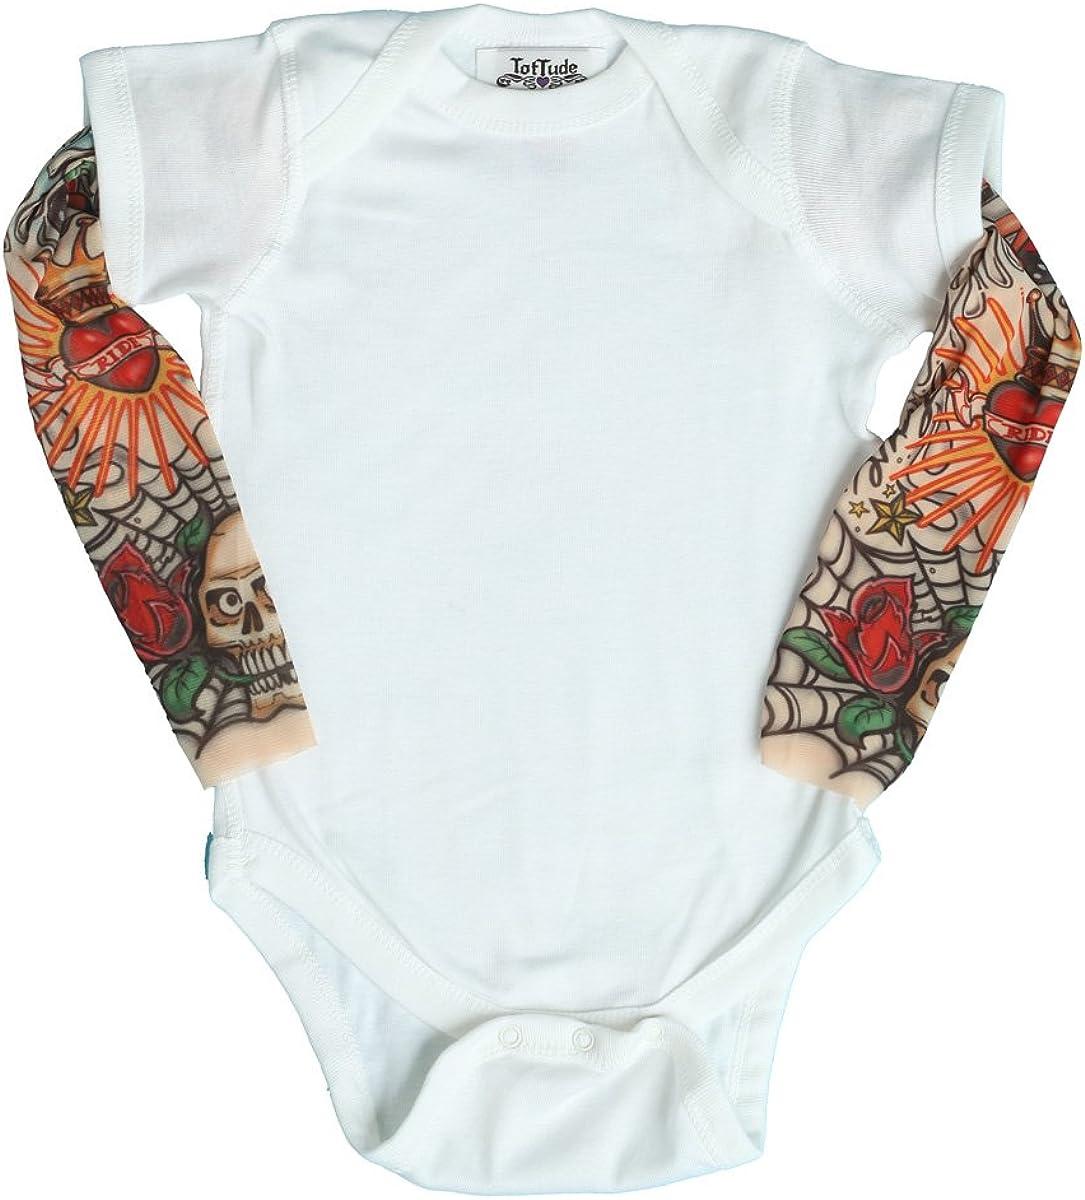 Tats /& Cats Printed Unisex Baby Short-Sleeved Bodysuit Romper Jumpsuit